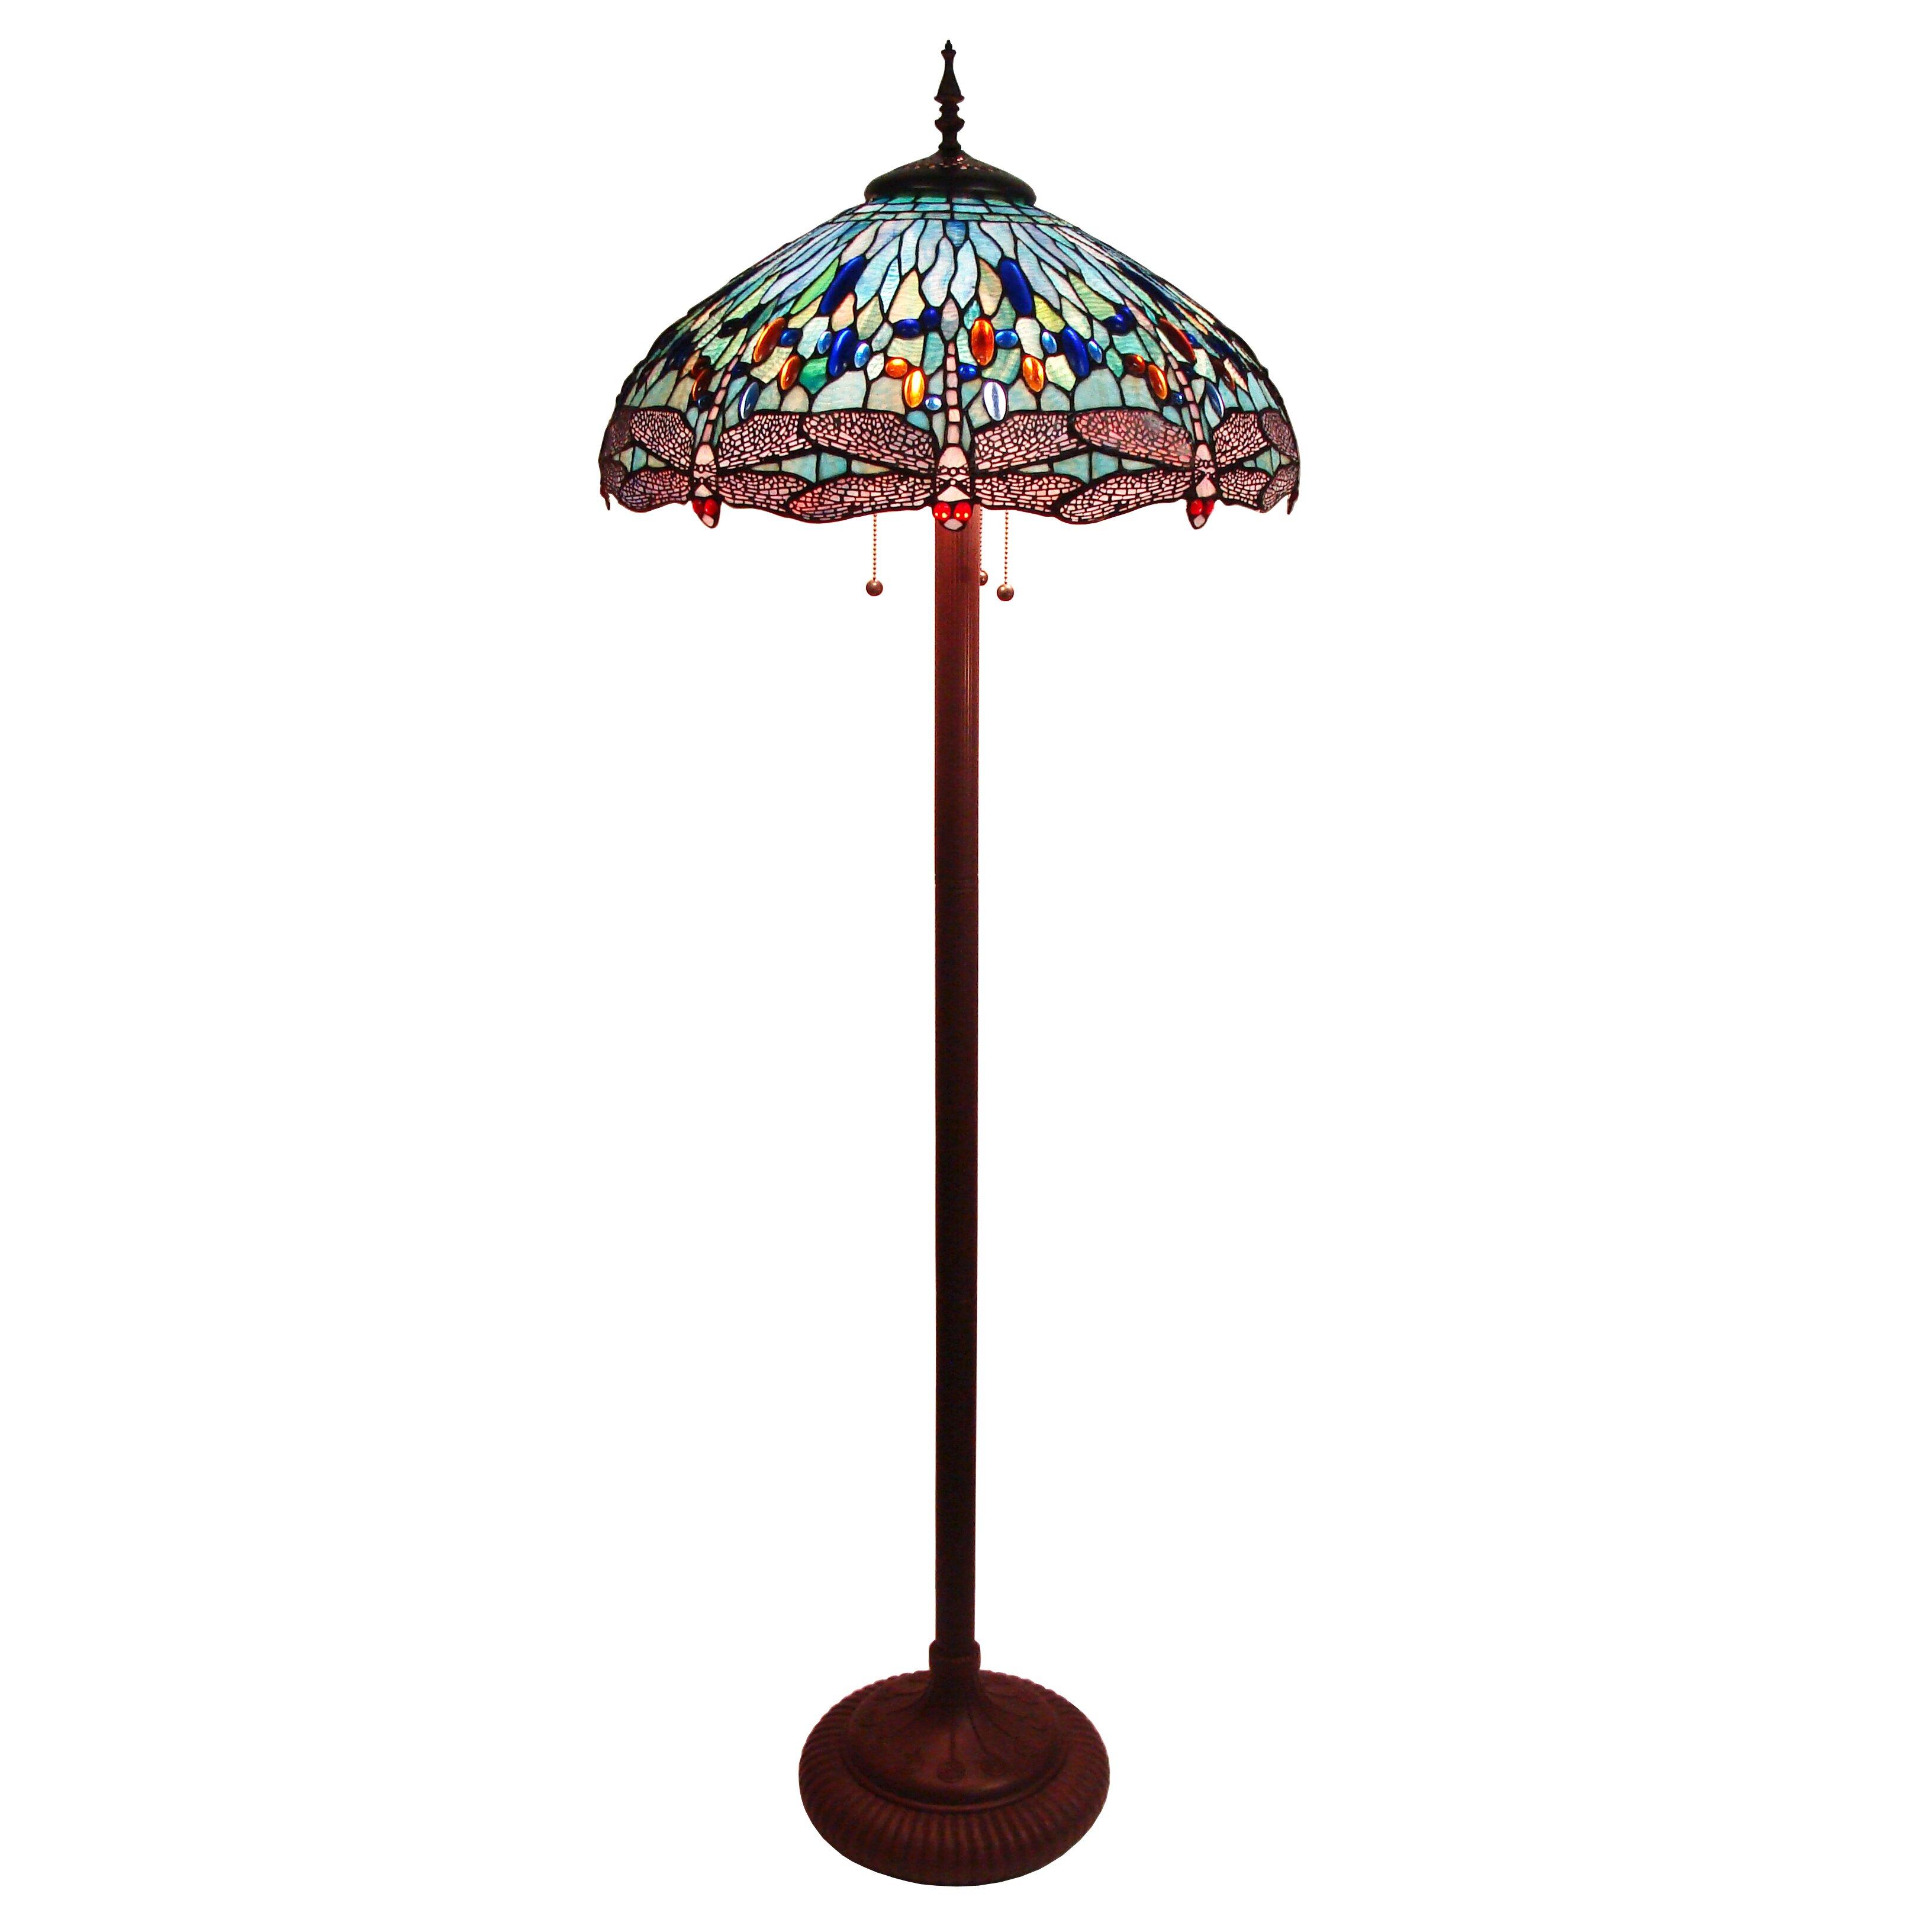 Fine Art Lighting Tiffany Dragonfly 65 Floor Lamp